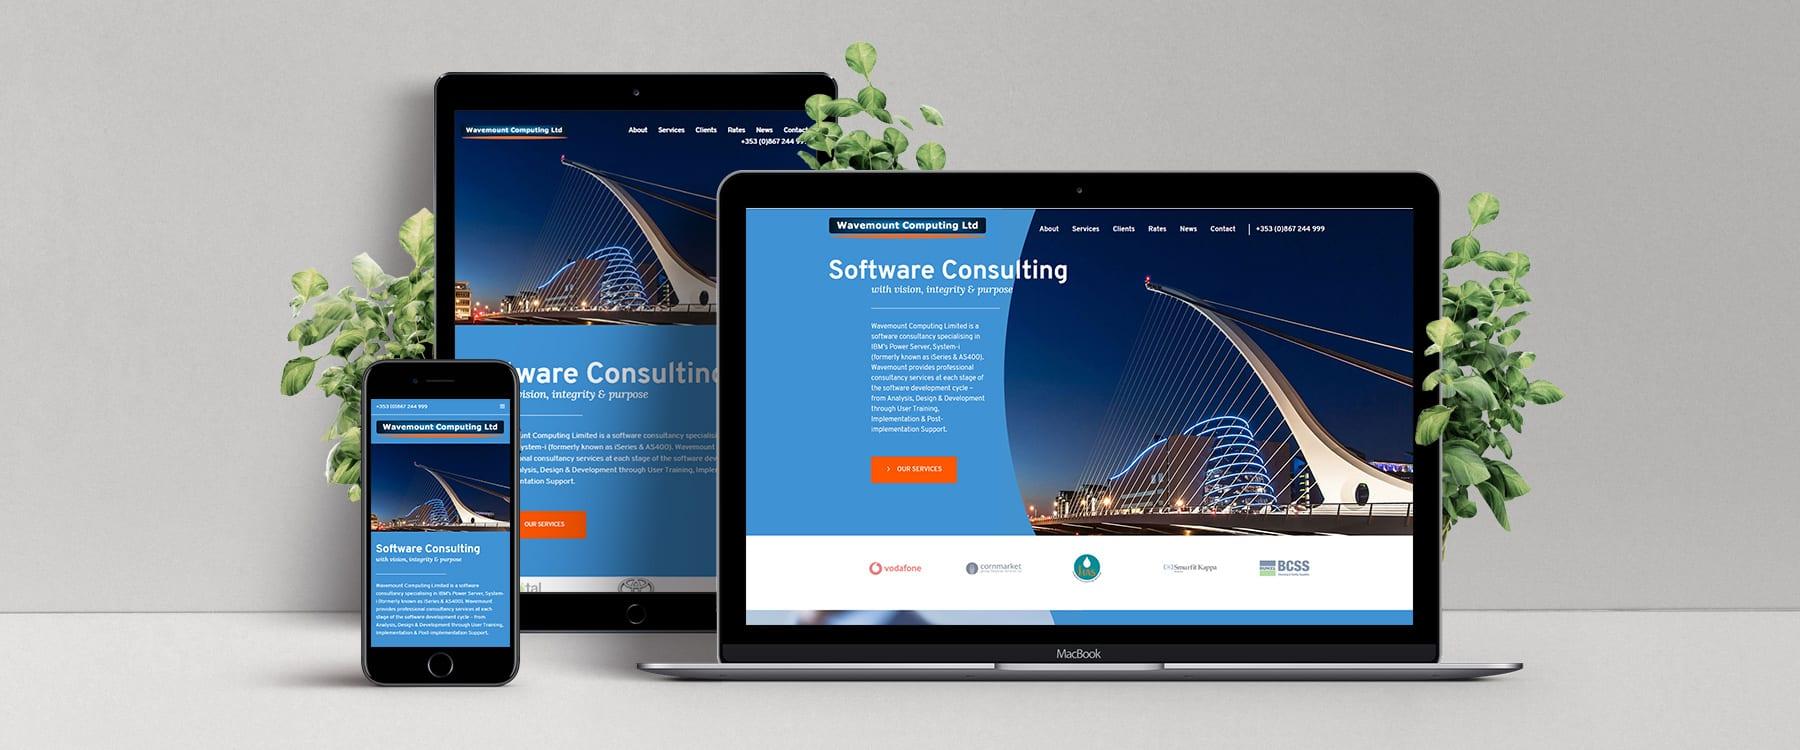 New Contemporary Website for Dublin Software Consultancy, Wavemount Computing Ltd Image